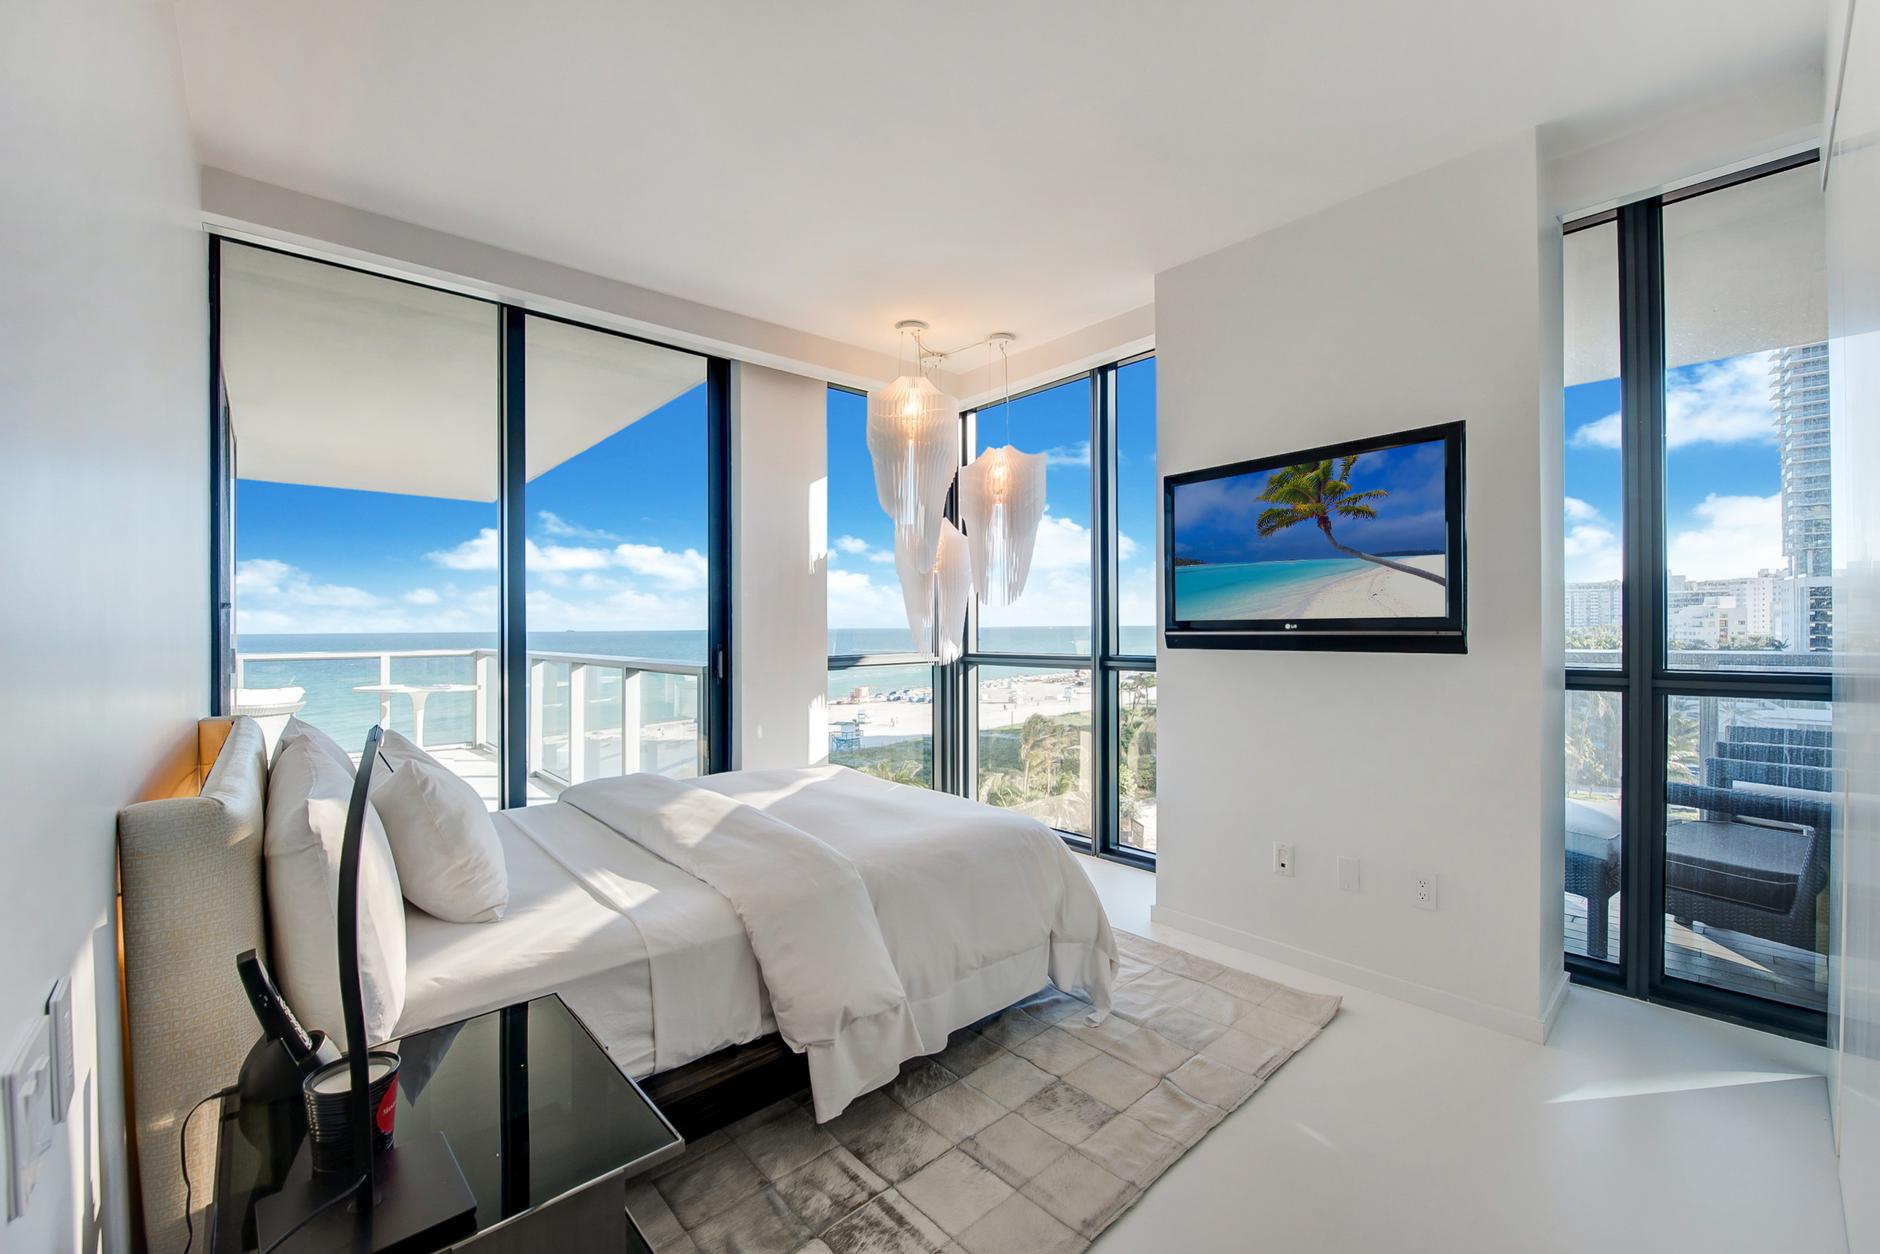 Квартира Захи Хадид в Майами продана за 5,75 млн долларов (галерея 6, фото 0)